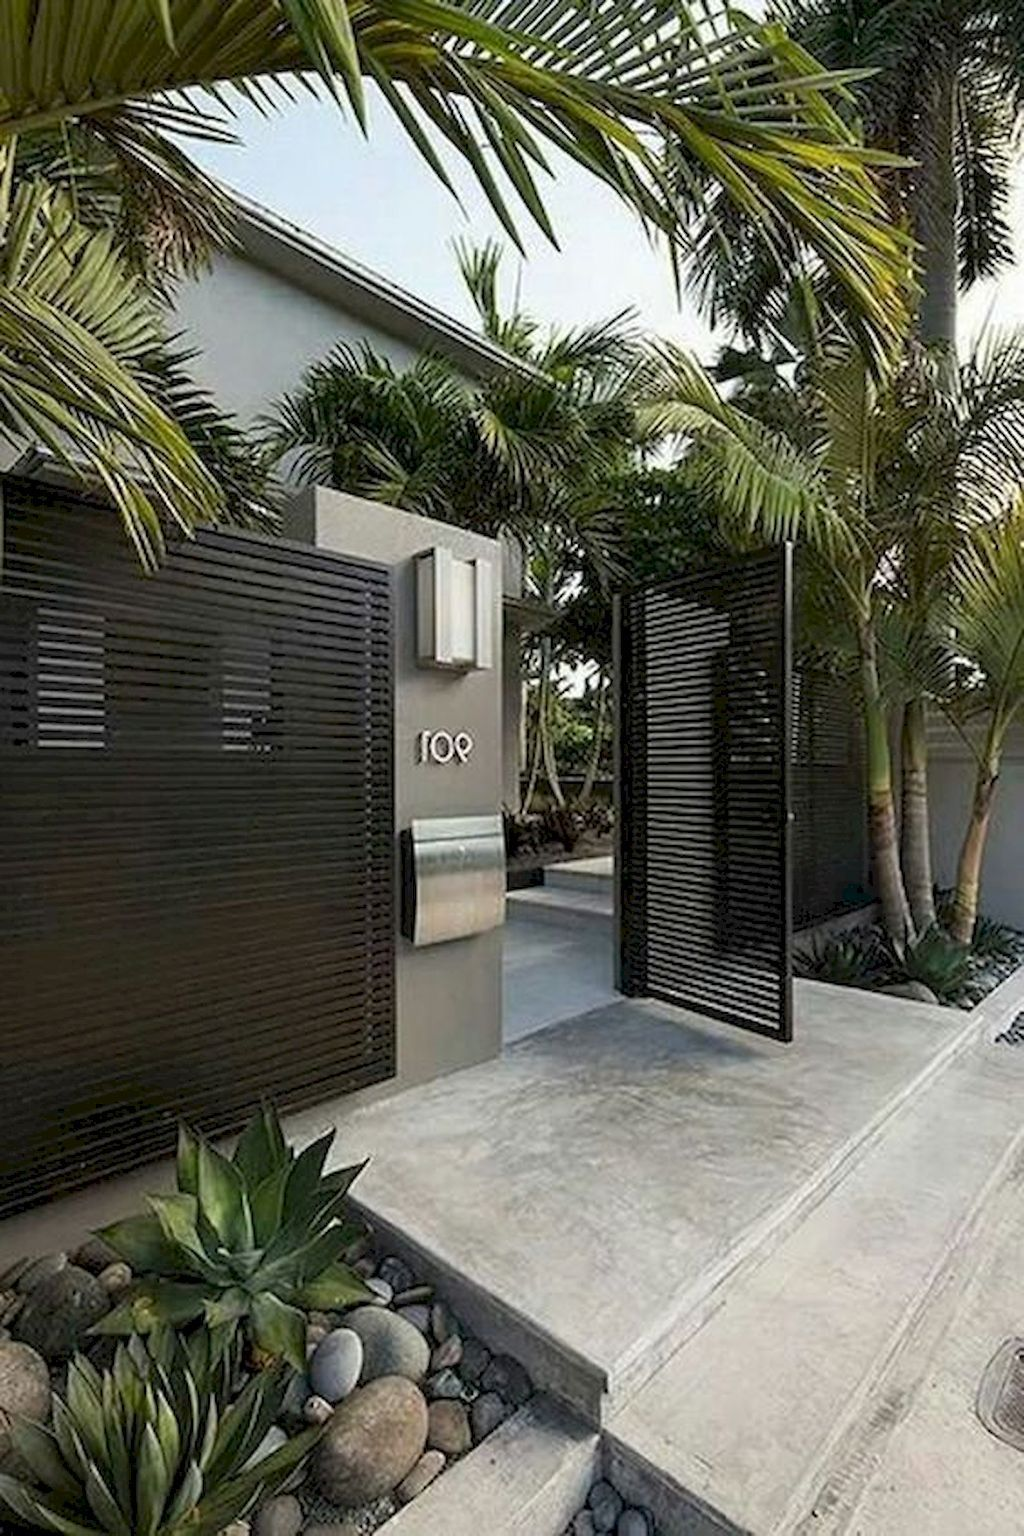 Beautiful Low Maintenance Front Yard Garden And Landscaping Ideas 21 Modern Landscape Design Modern Landscaping Modern Front Yard